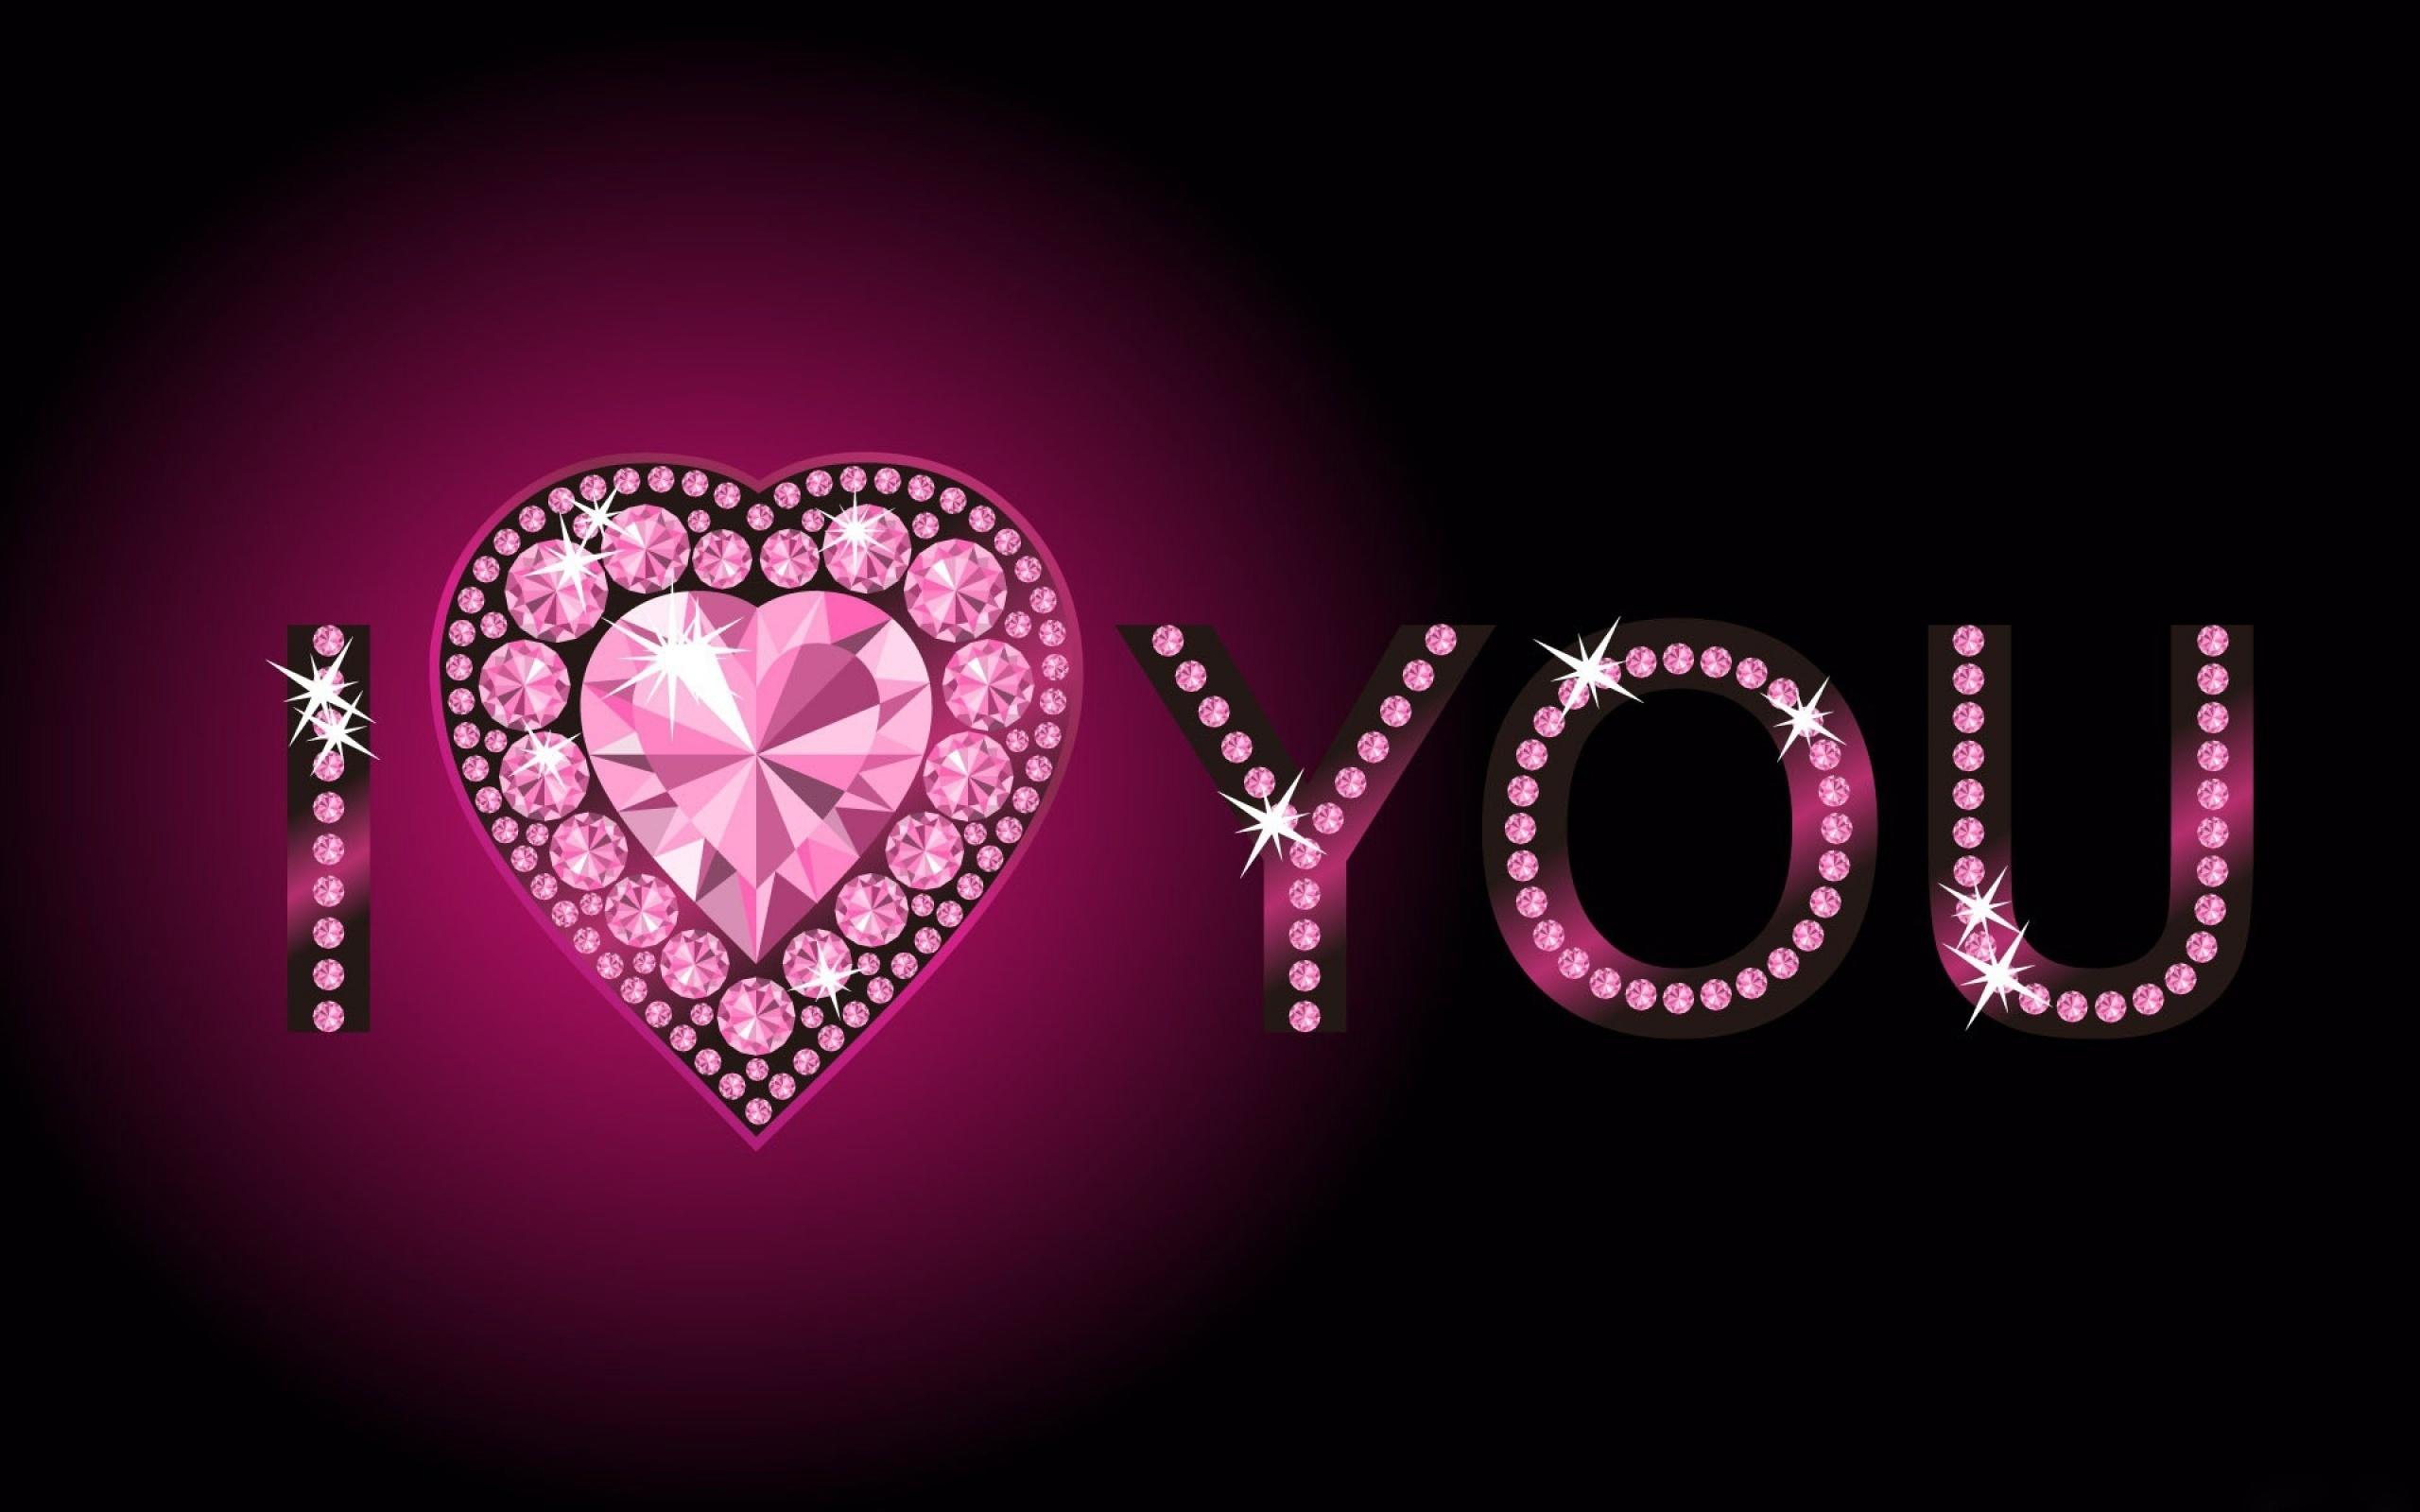 Diamond Love Heart 2560 x 1600 Download Close 2560x1600